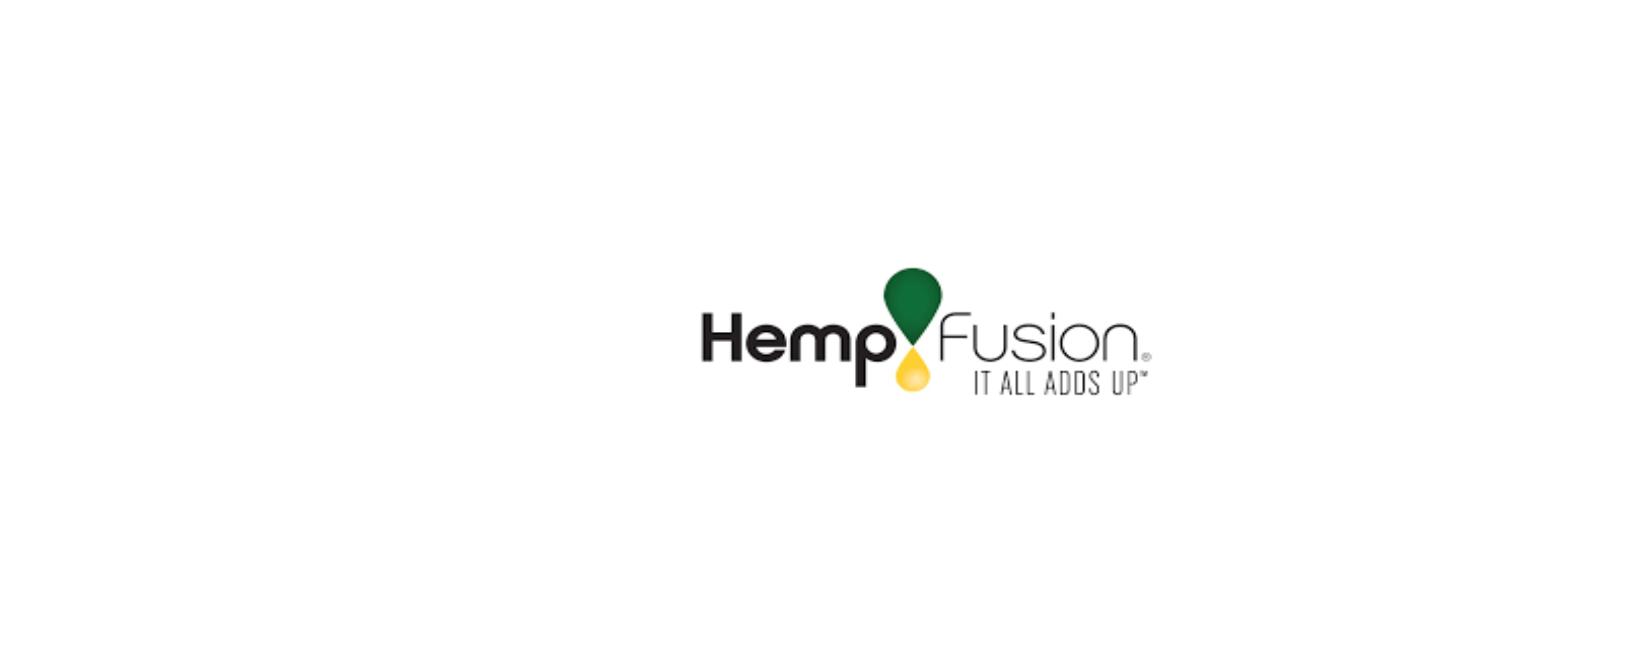 HempFusion Discount Code 2021